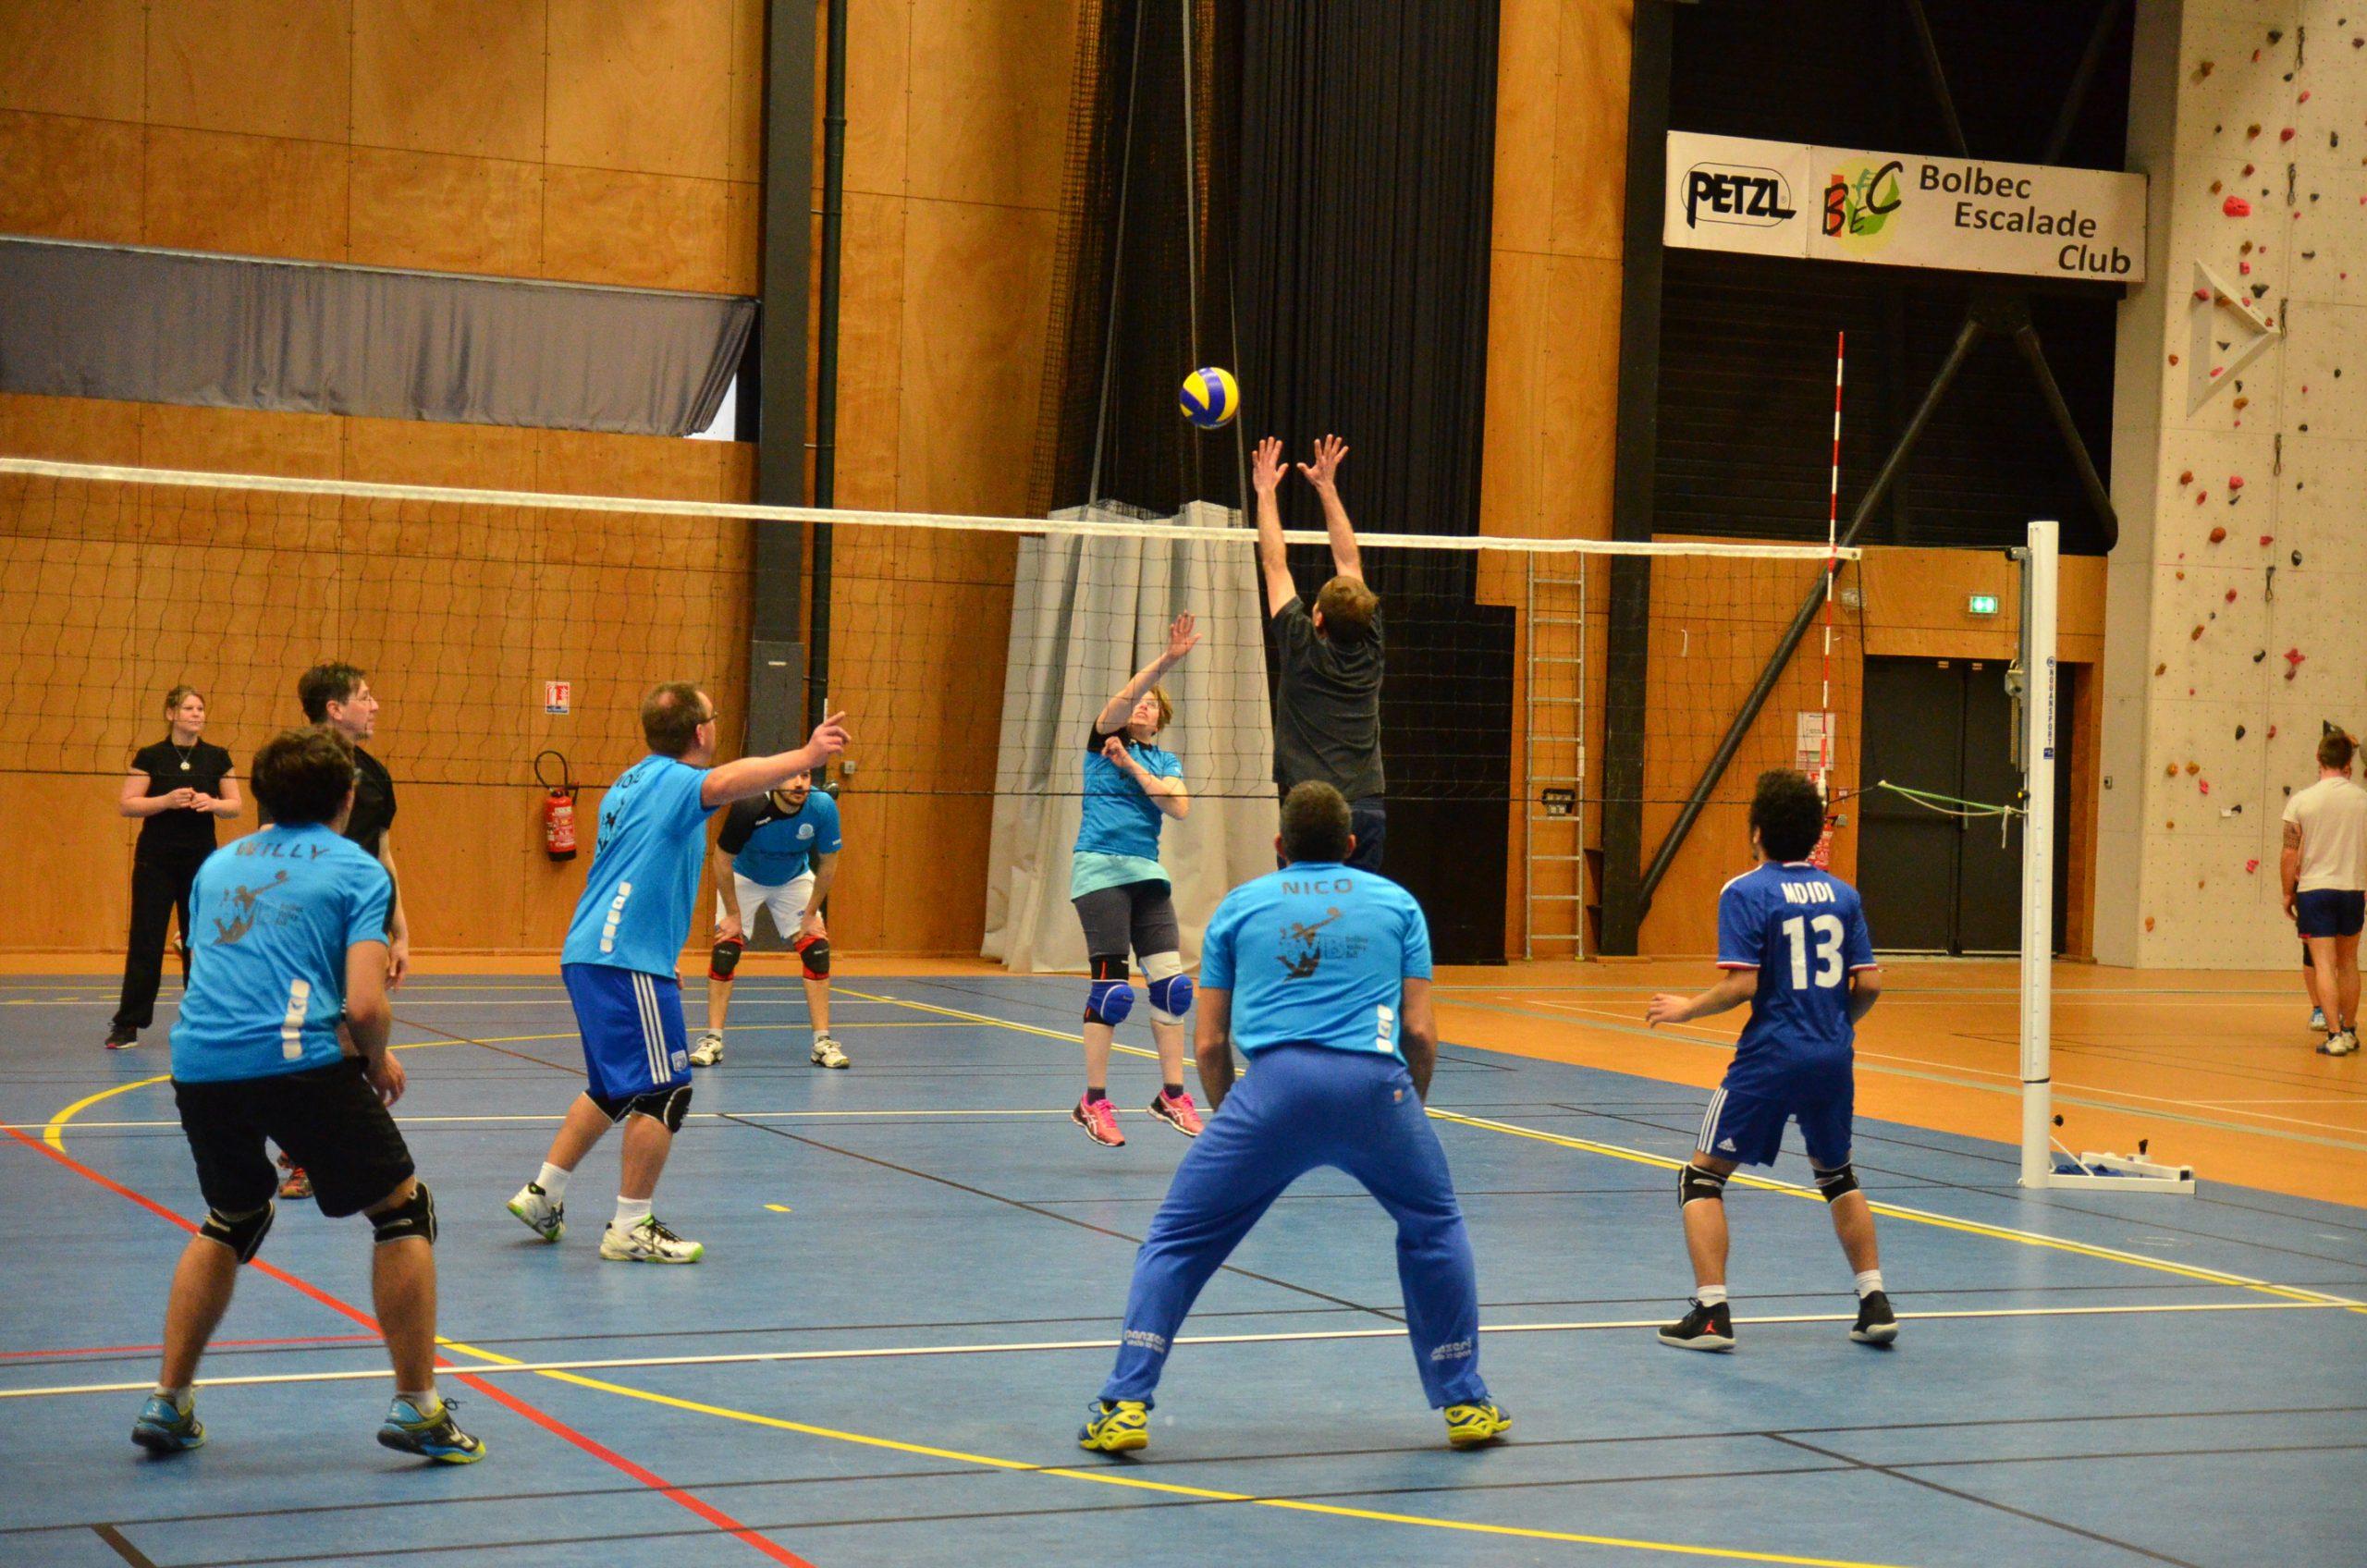 Bolbec Volley Ball - Ville De Bolbec avec Piscine Bolbec